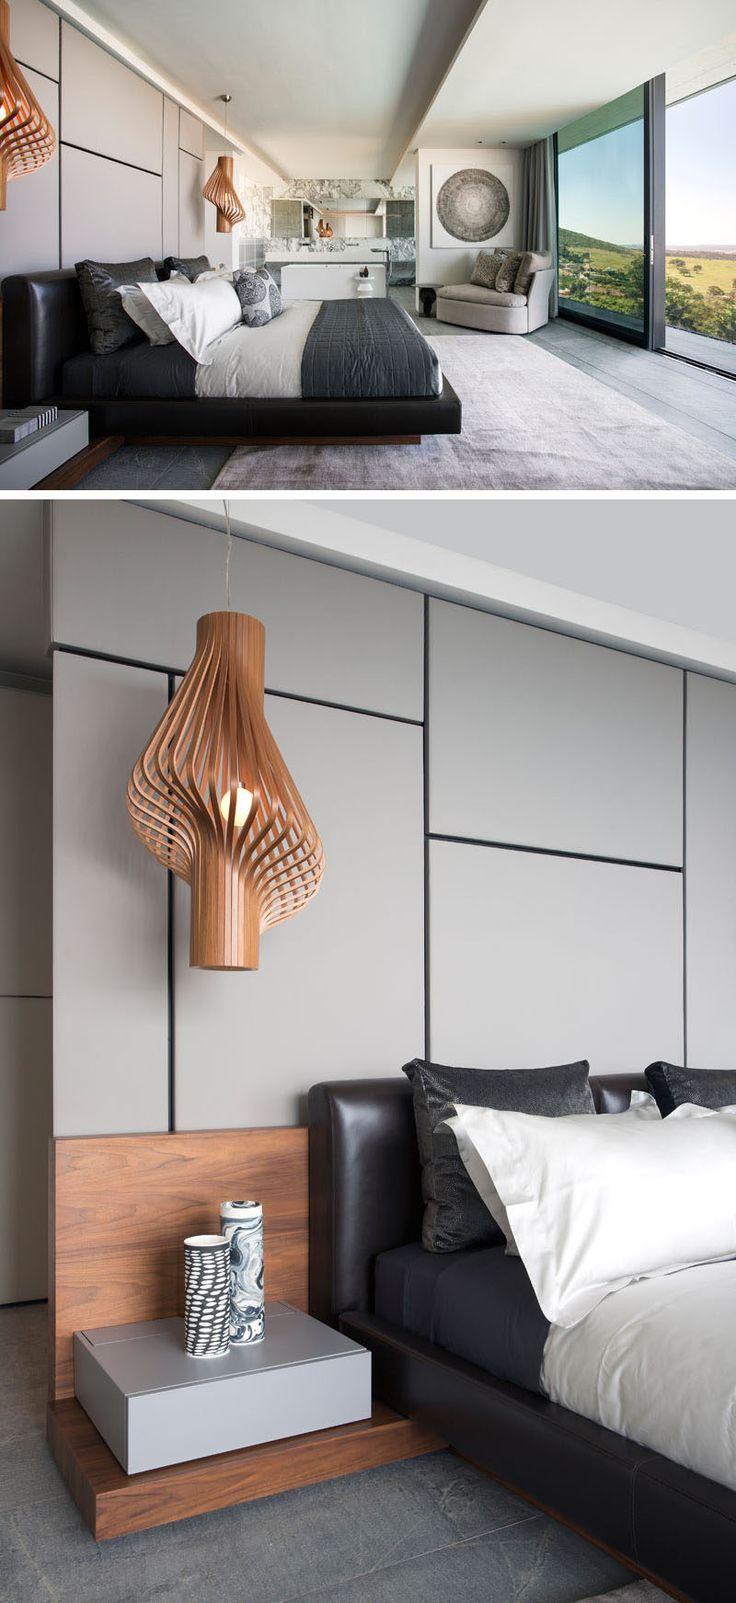 Best 25+ Modern master bedroom ideas on Pinterest | Modern ...